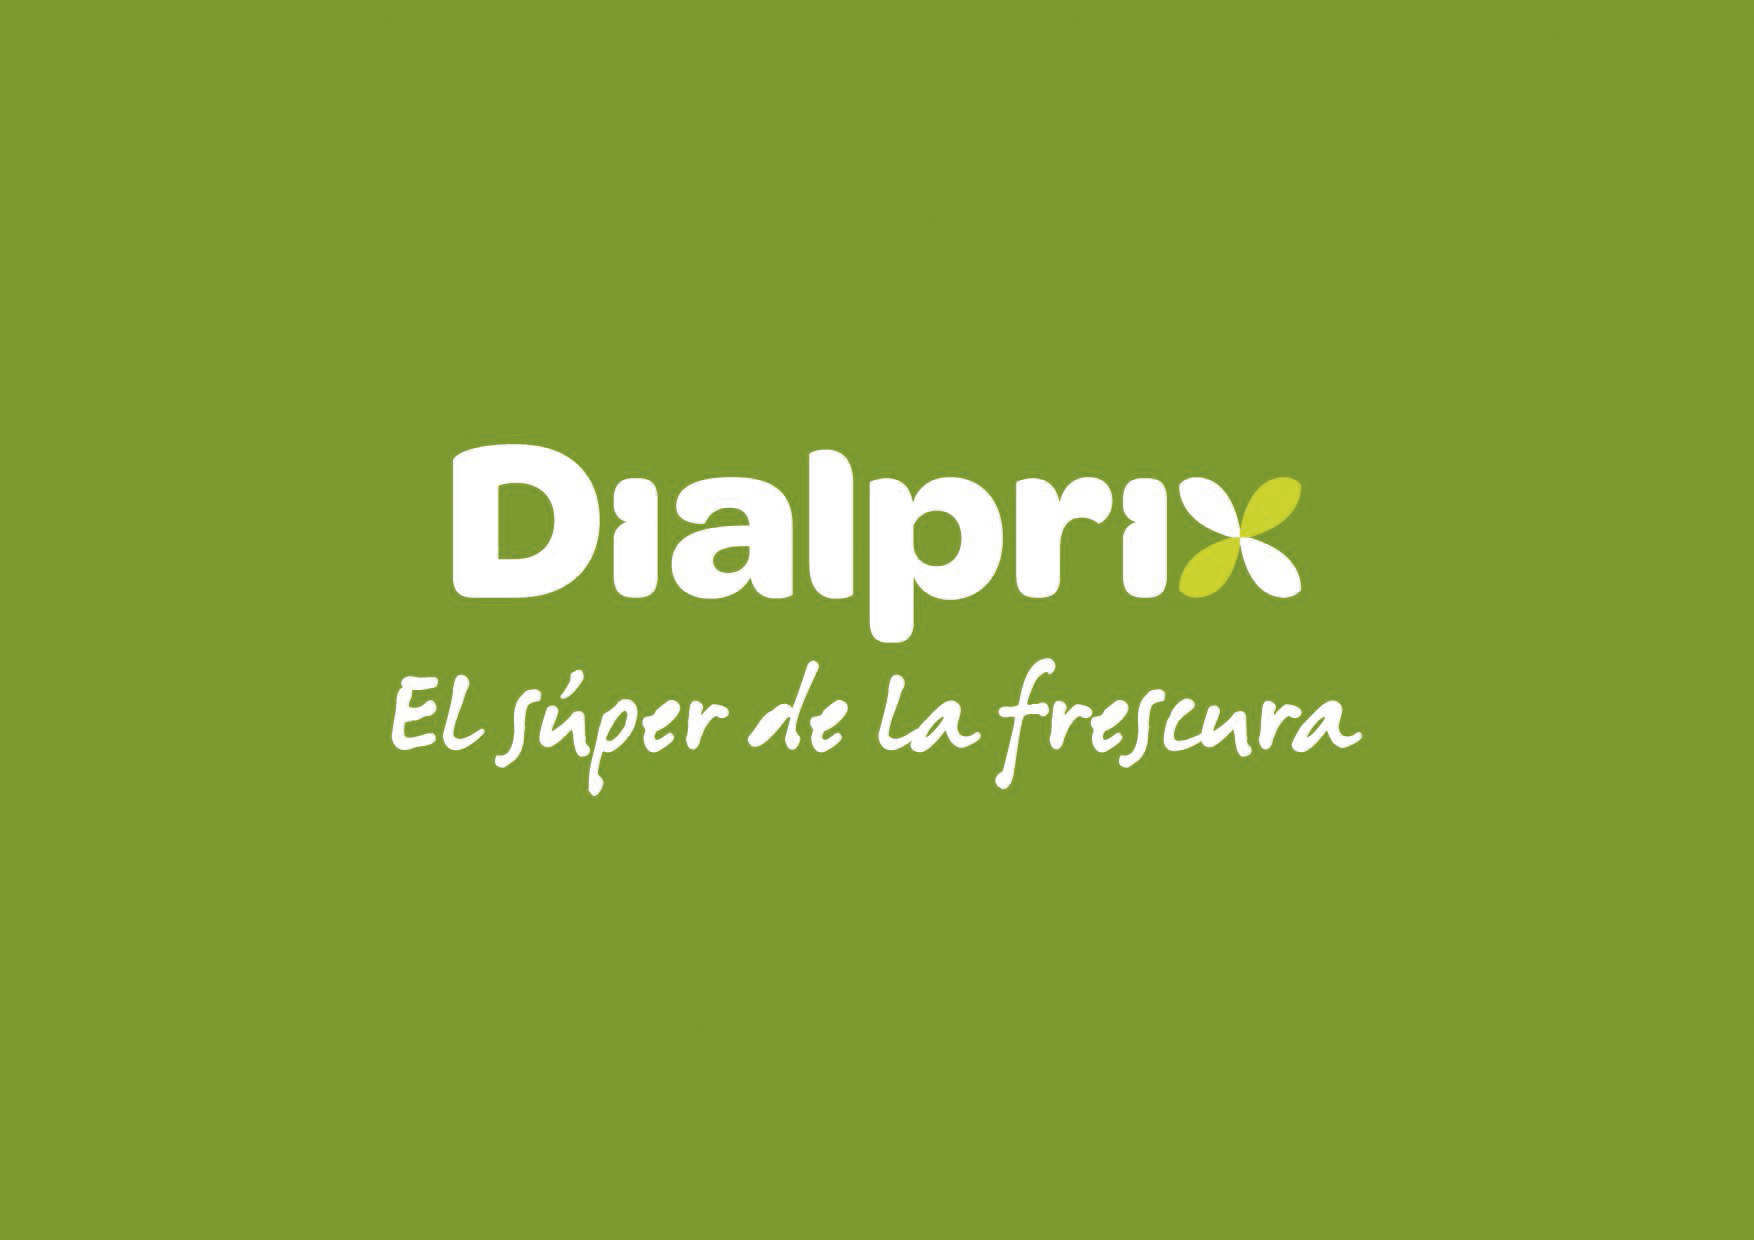 dialprix tenerife